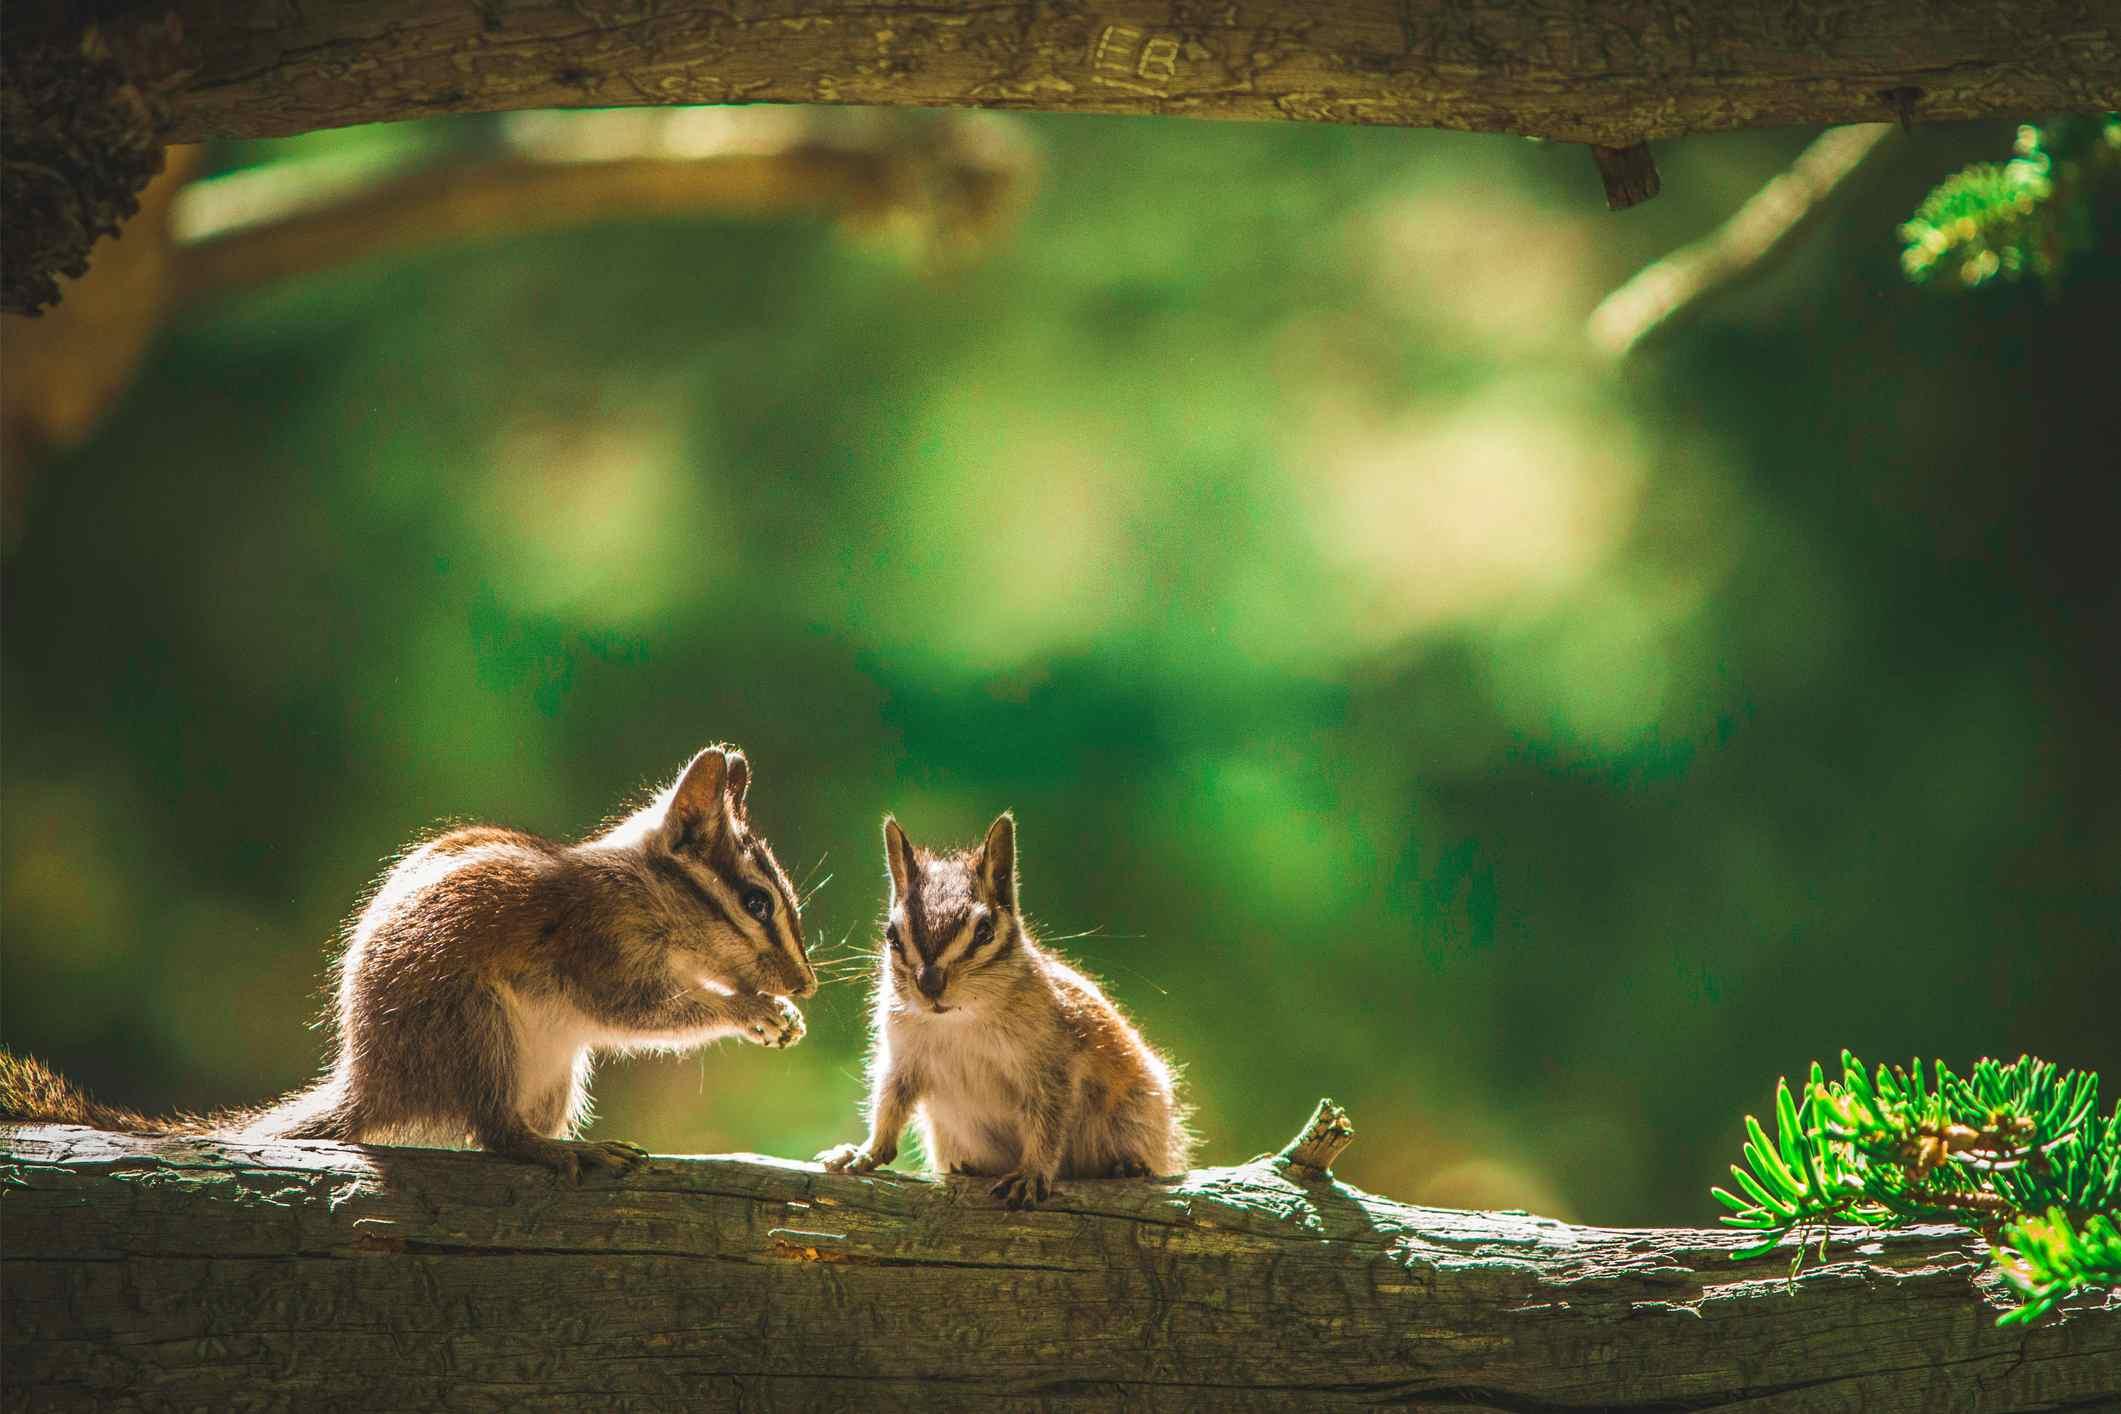 Pair of chipmunks